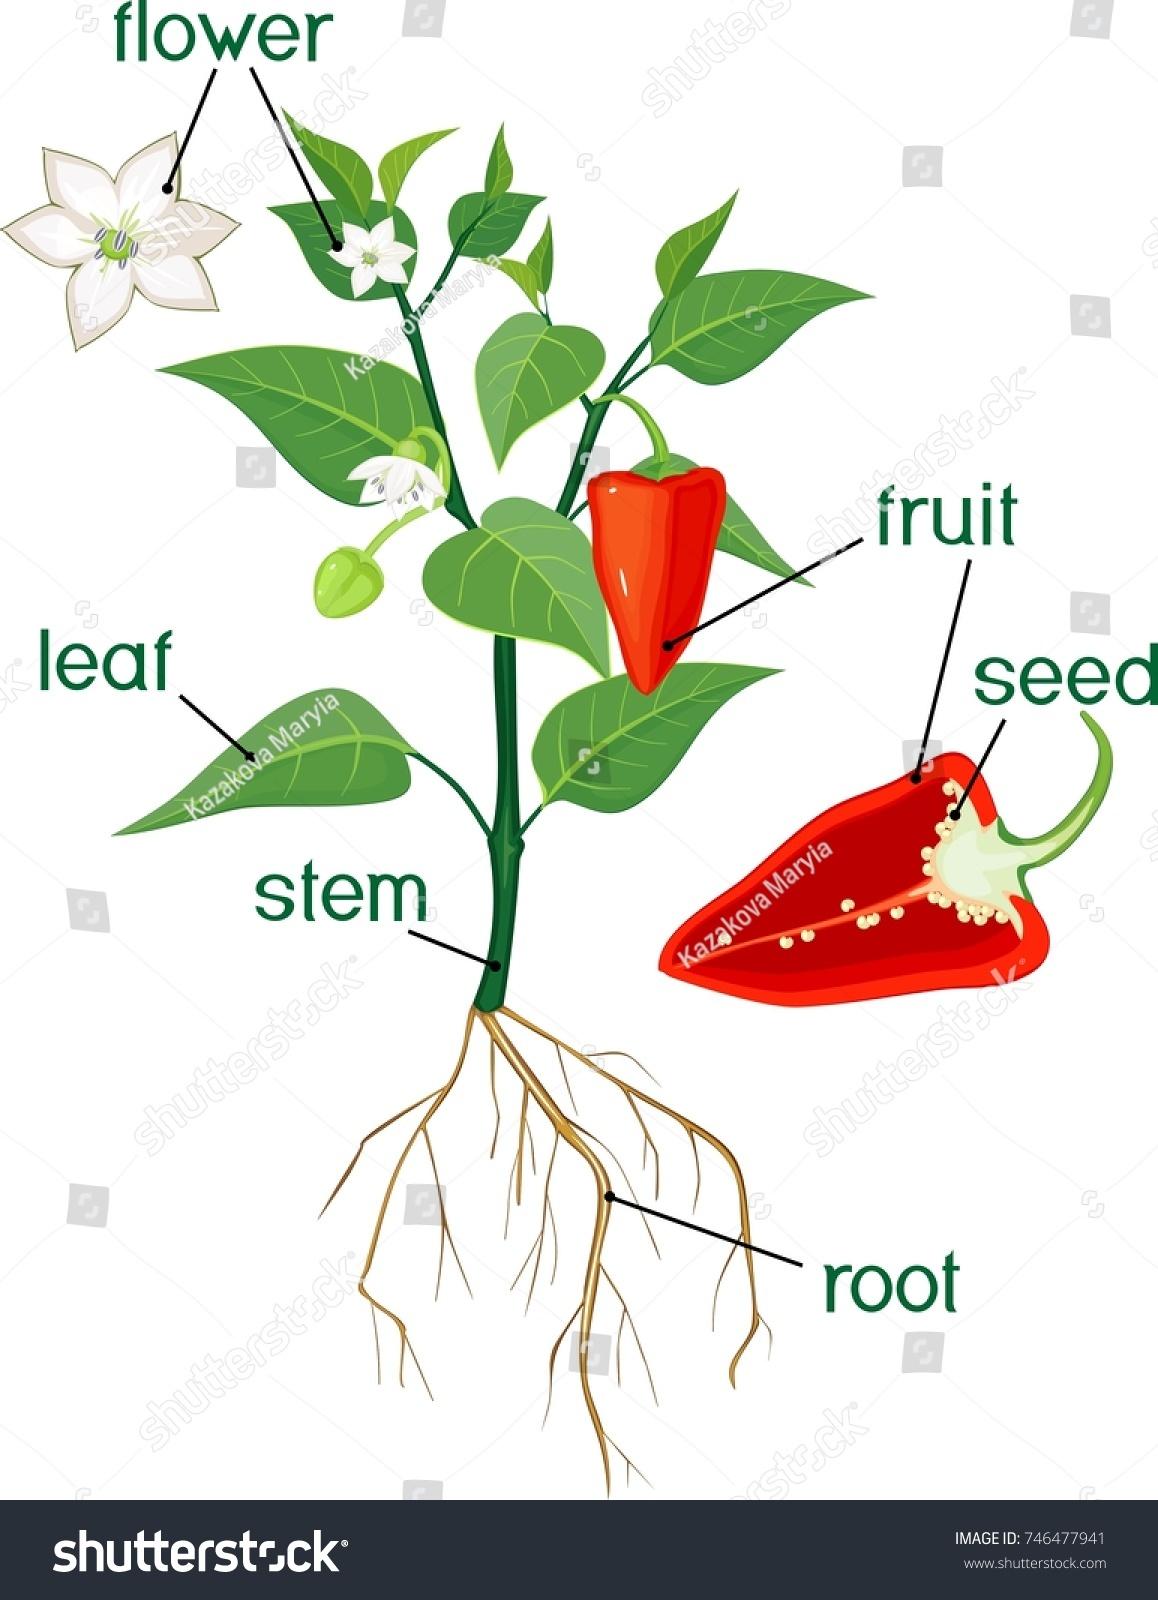 Parts Plant Morphology Flowering Bell Pepper Stock Vector 746477941